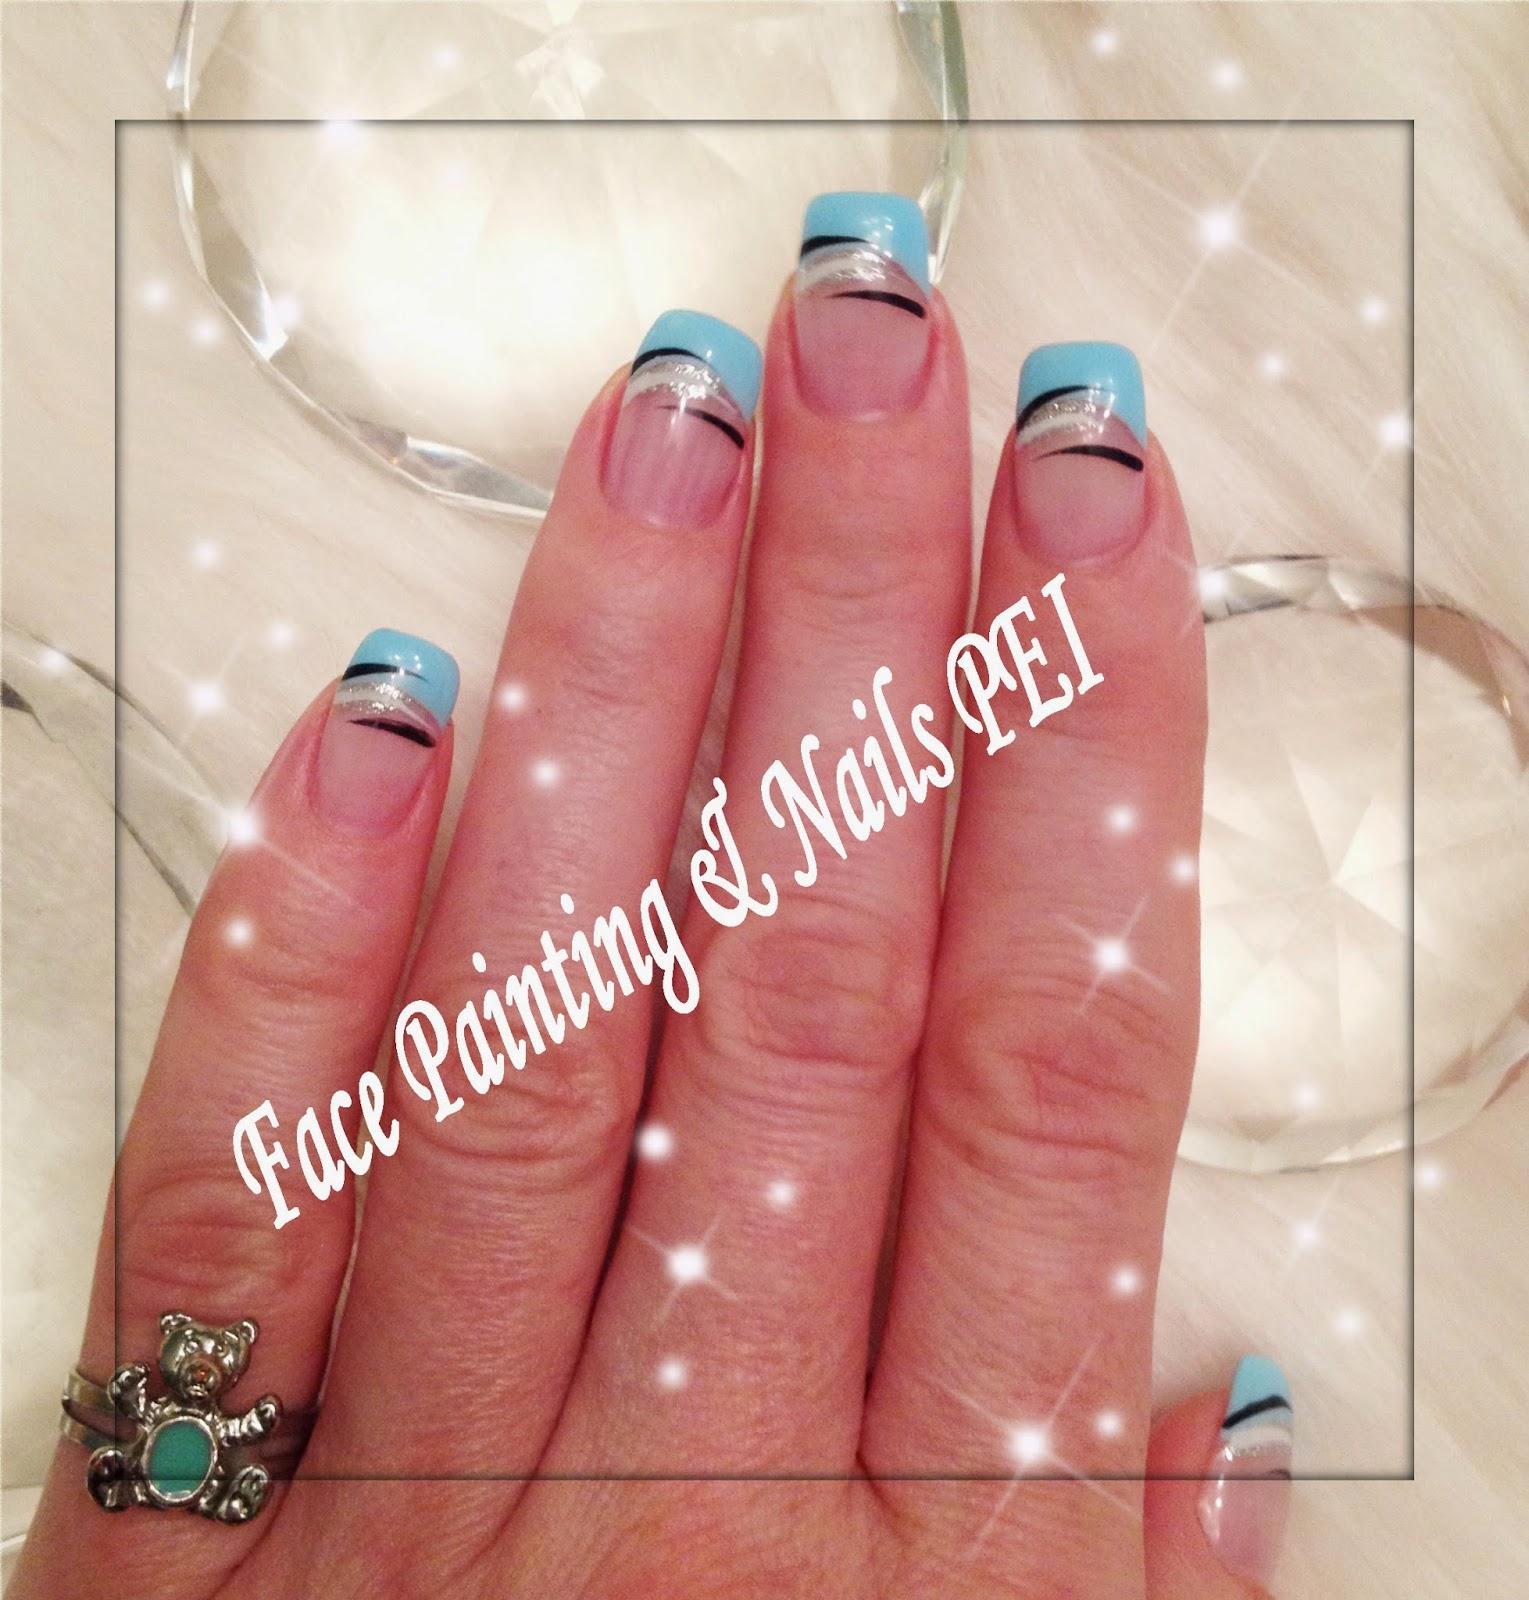 Face Painting & Nails PEI: UV-Gel Nails